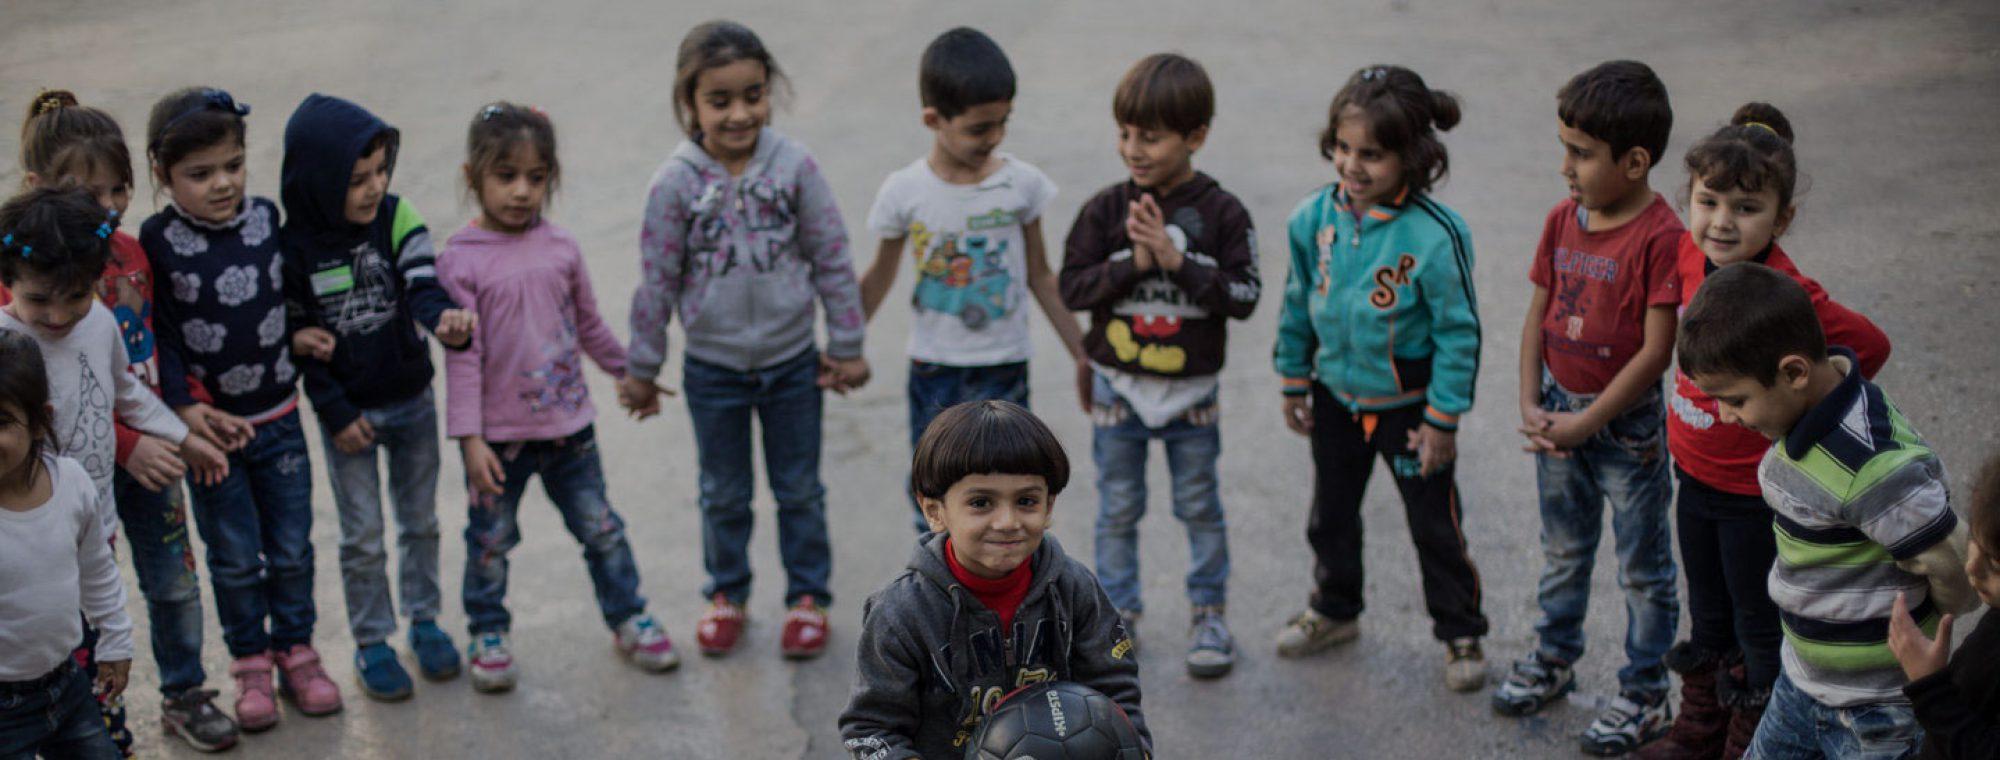 Refugee children playing at a JRS school in Lebanon. (Kristóf Hölvényi/Jesuit Refugee Service)